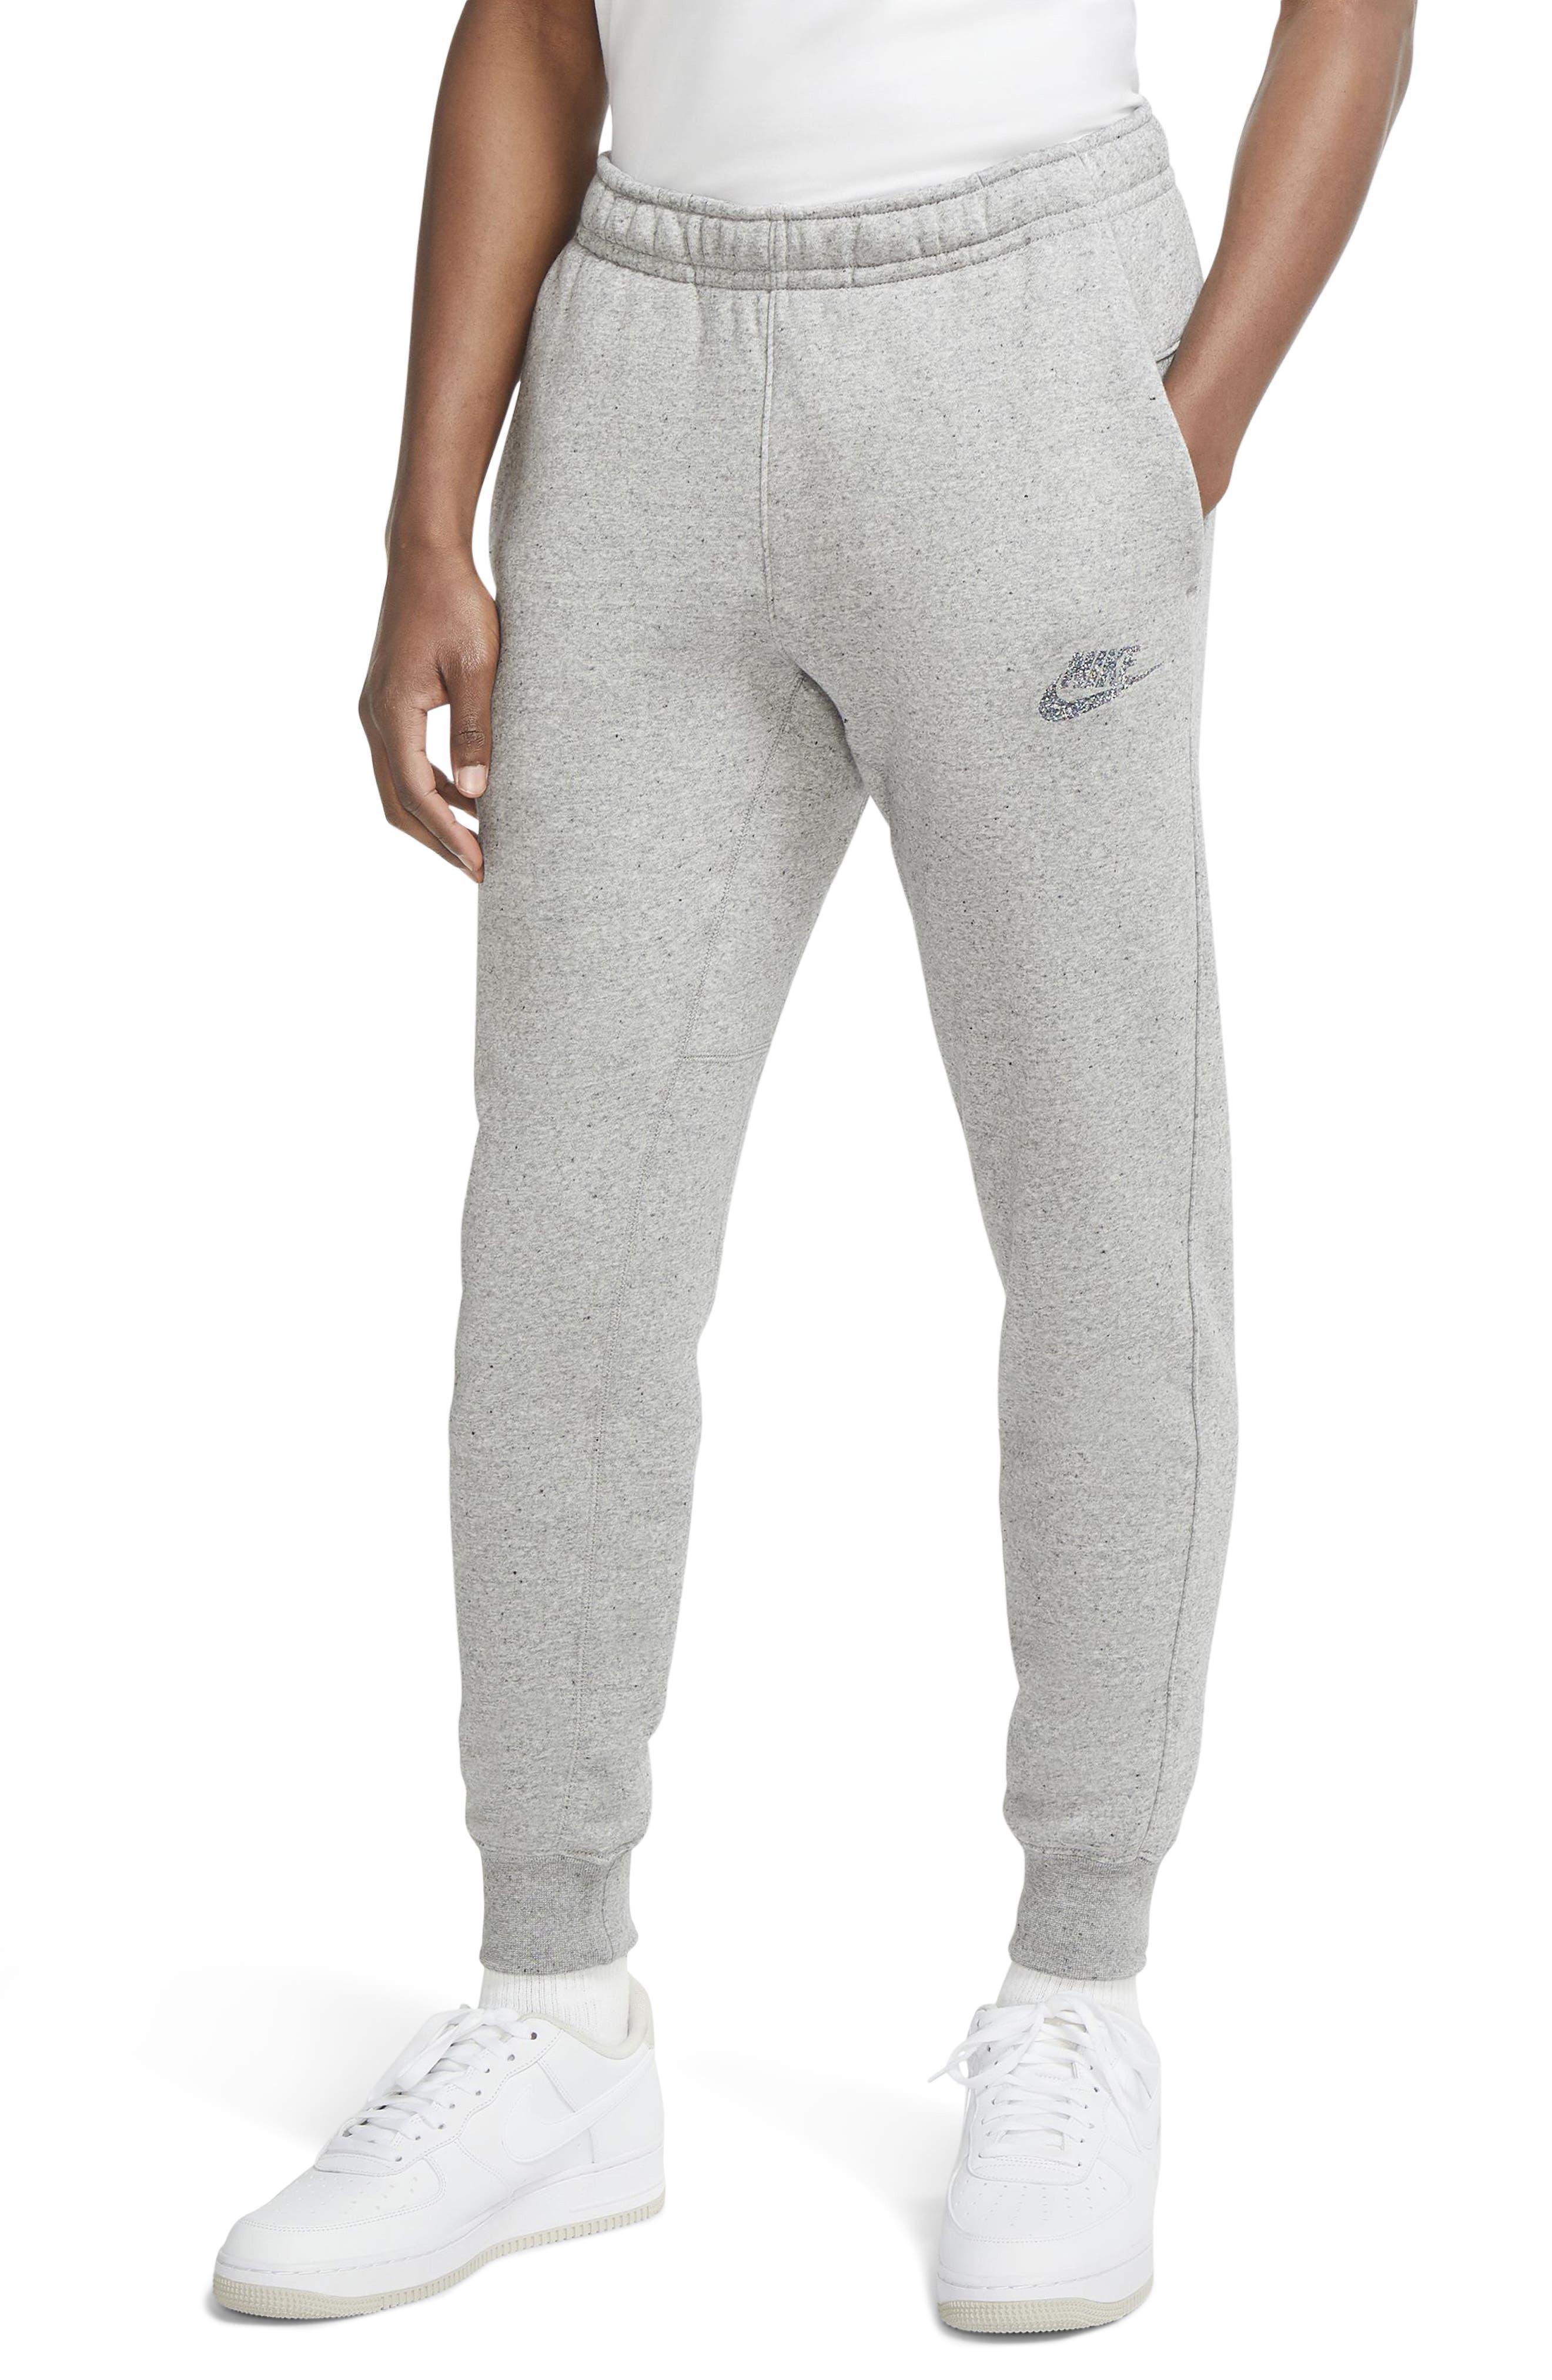 Men's Nike Joggers & Sweatpants